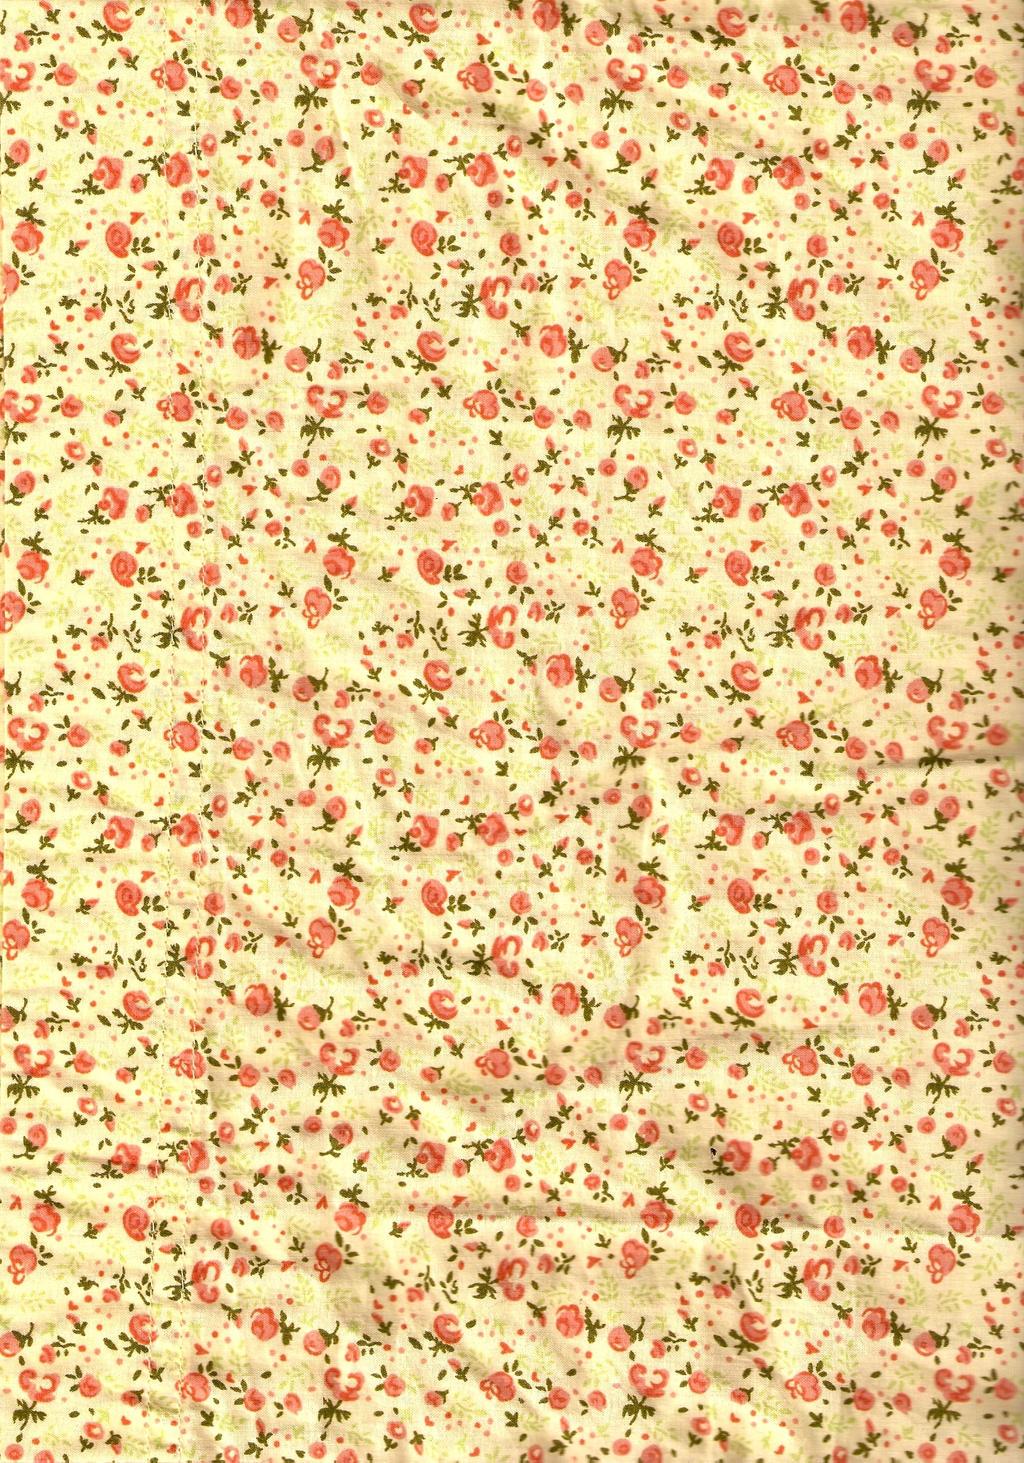 Floral PJ 2 - Fabric Texture